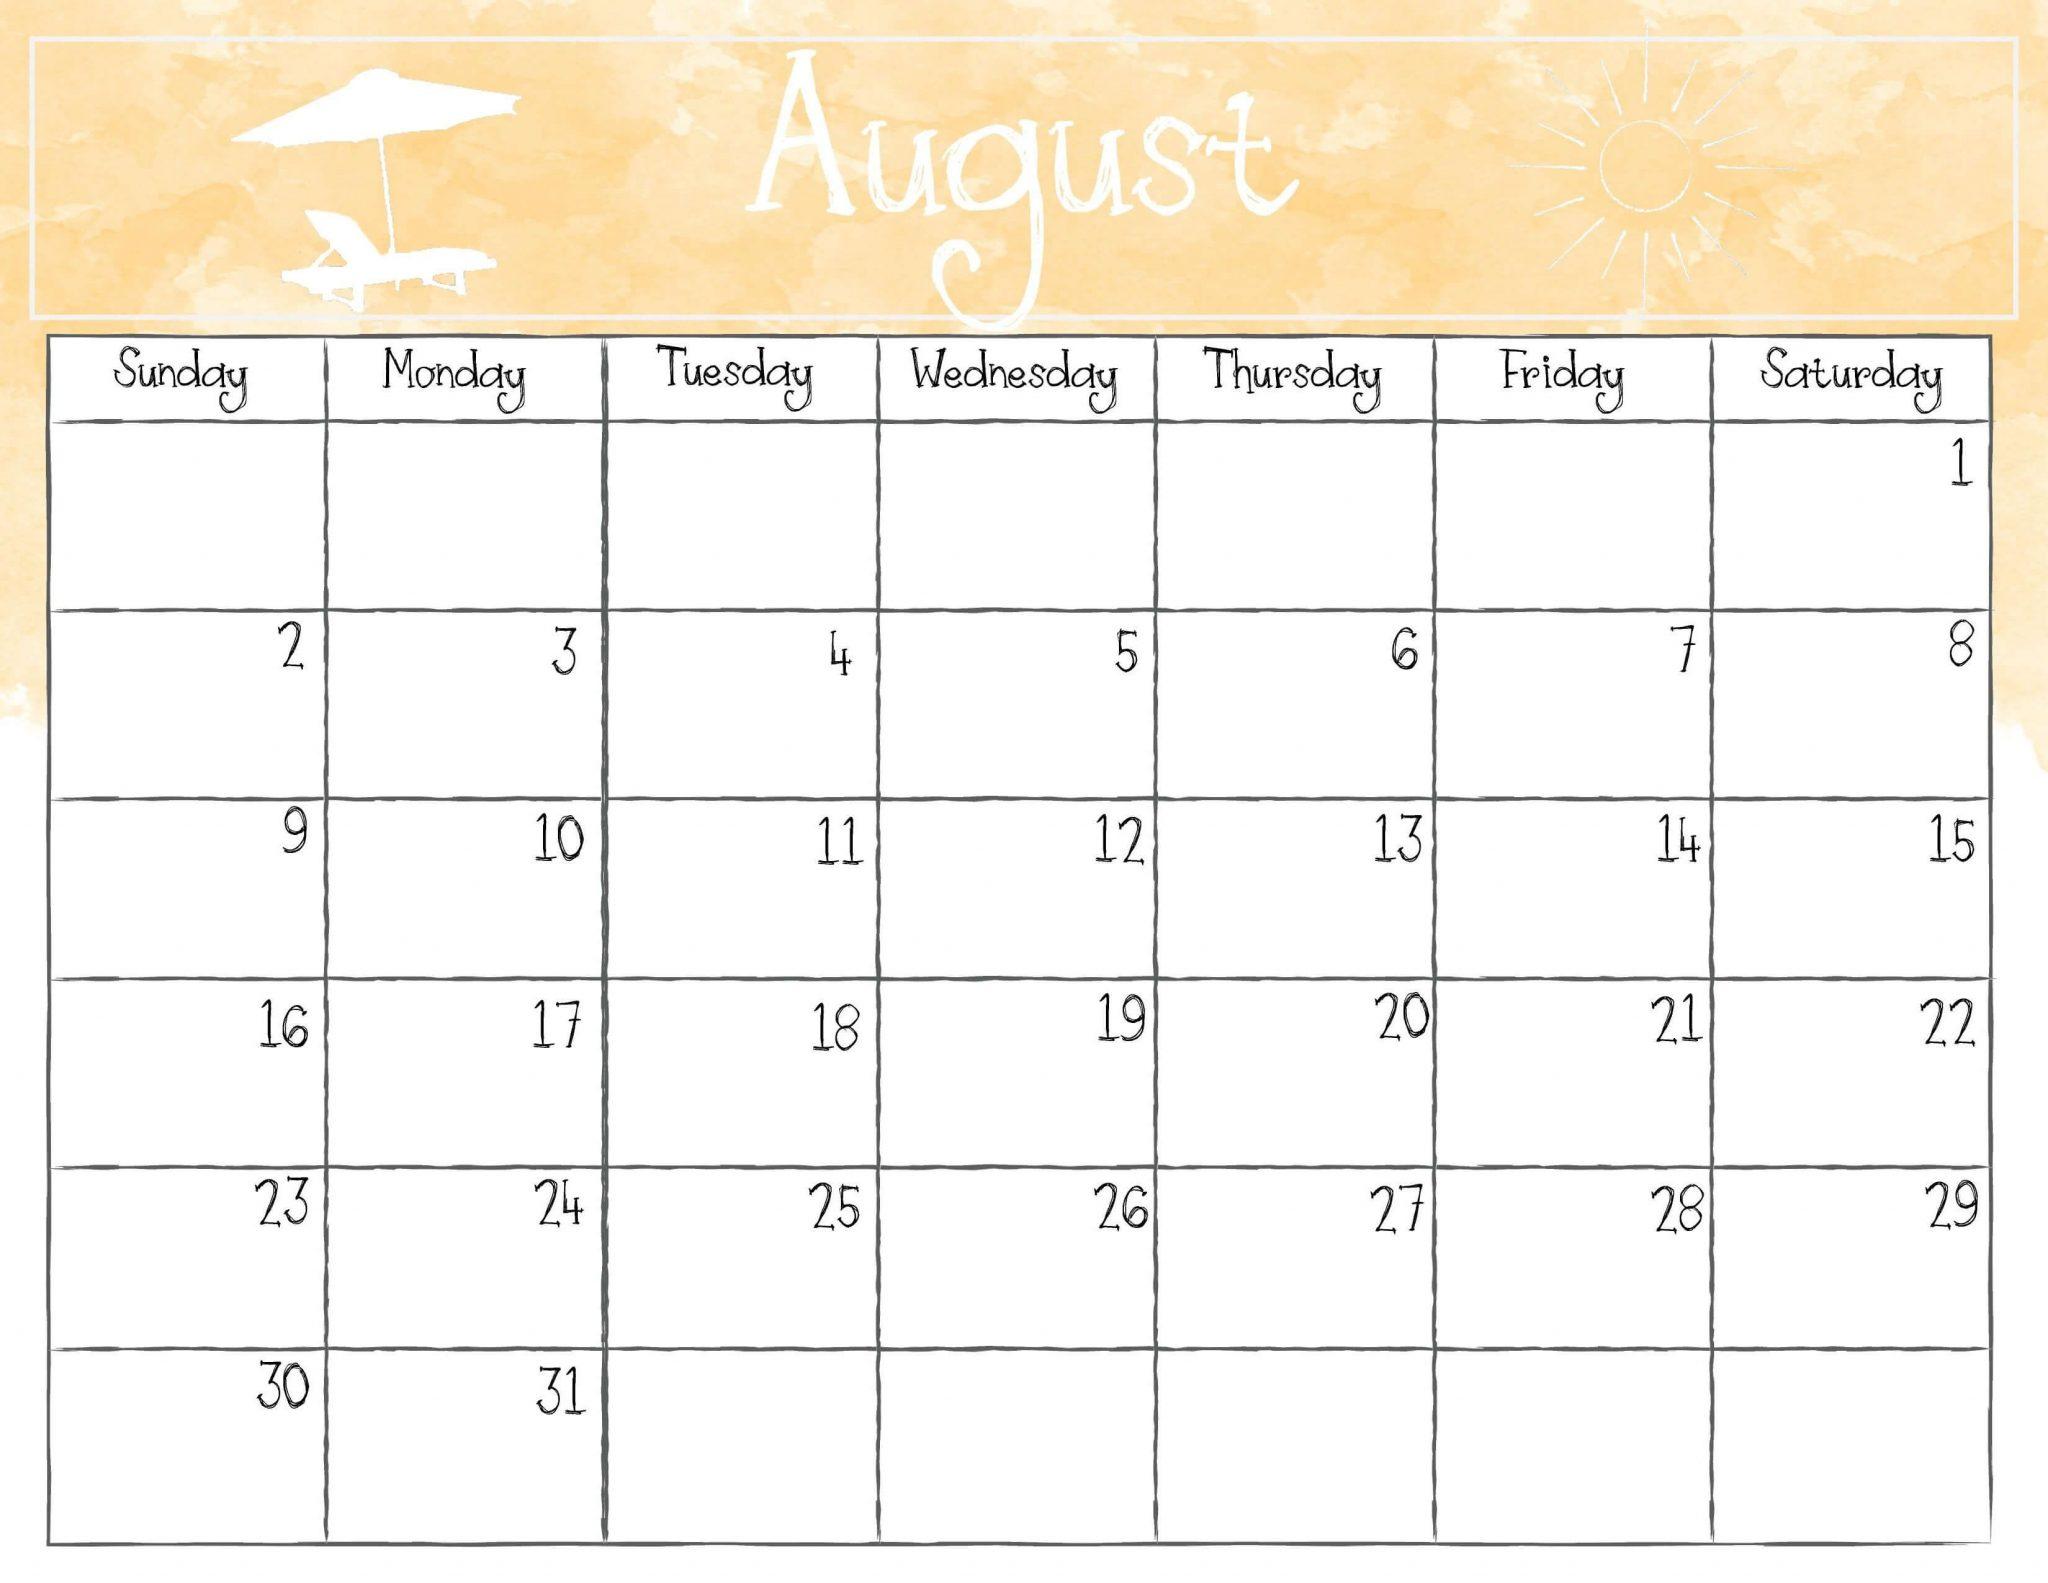 Watercolor August 2020 Calendar